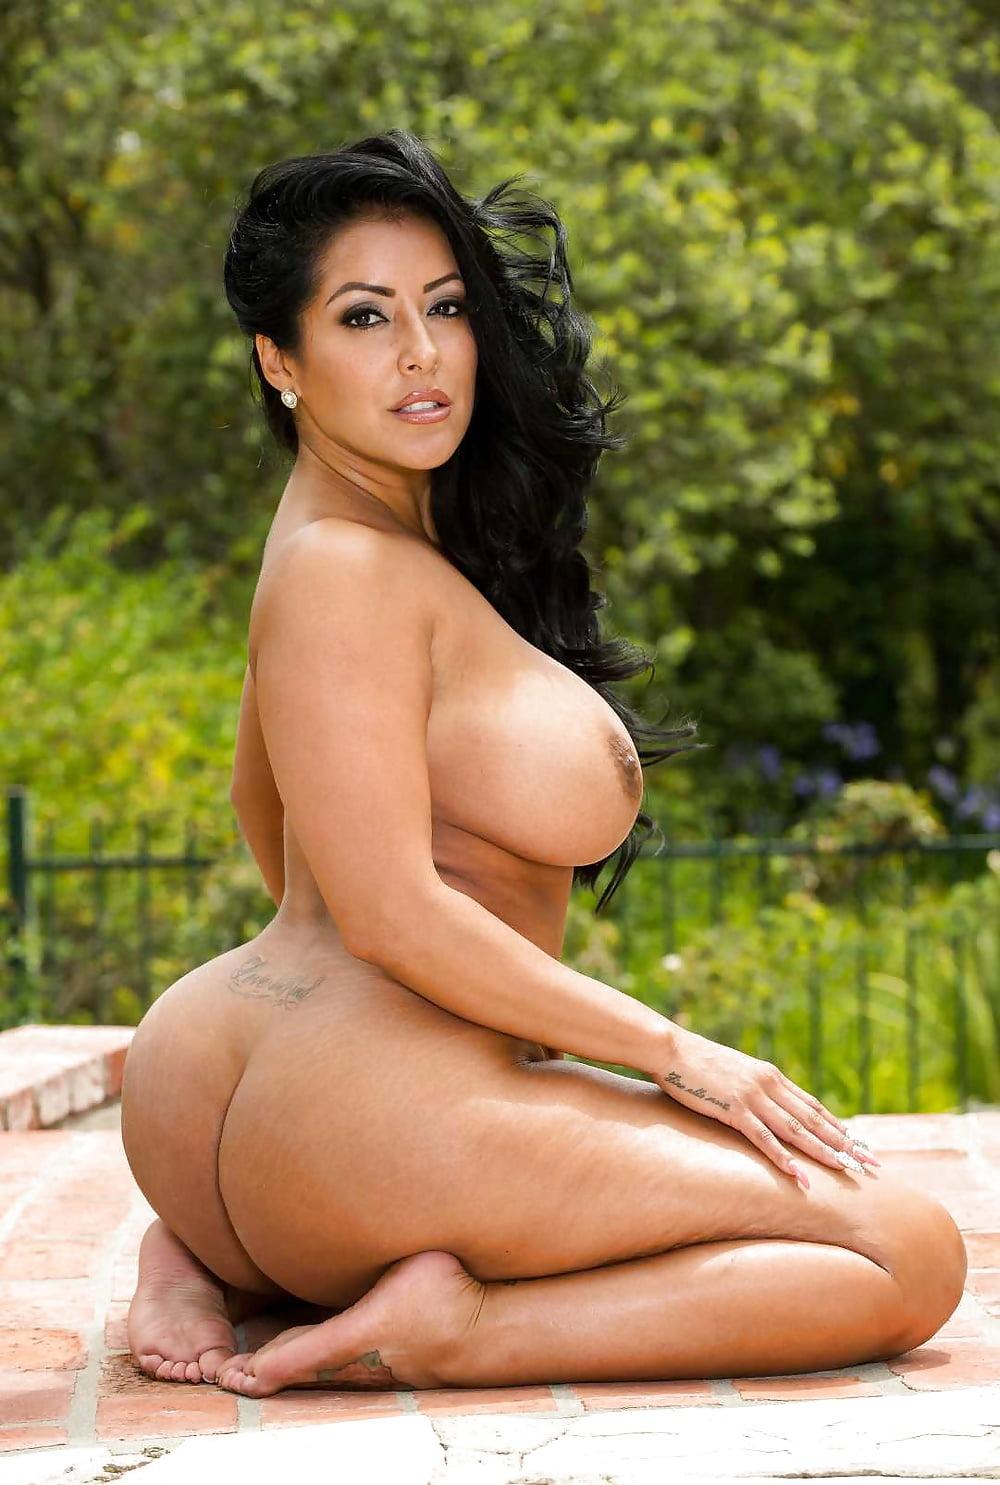 Naked sex full figured latina big boobs nude girls readnig hot